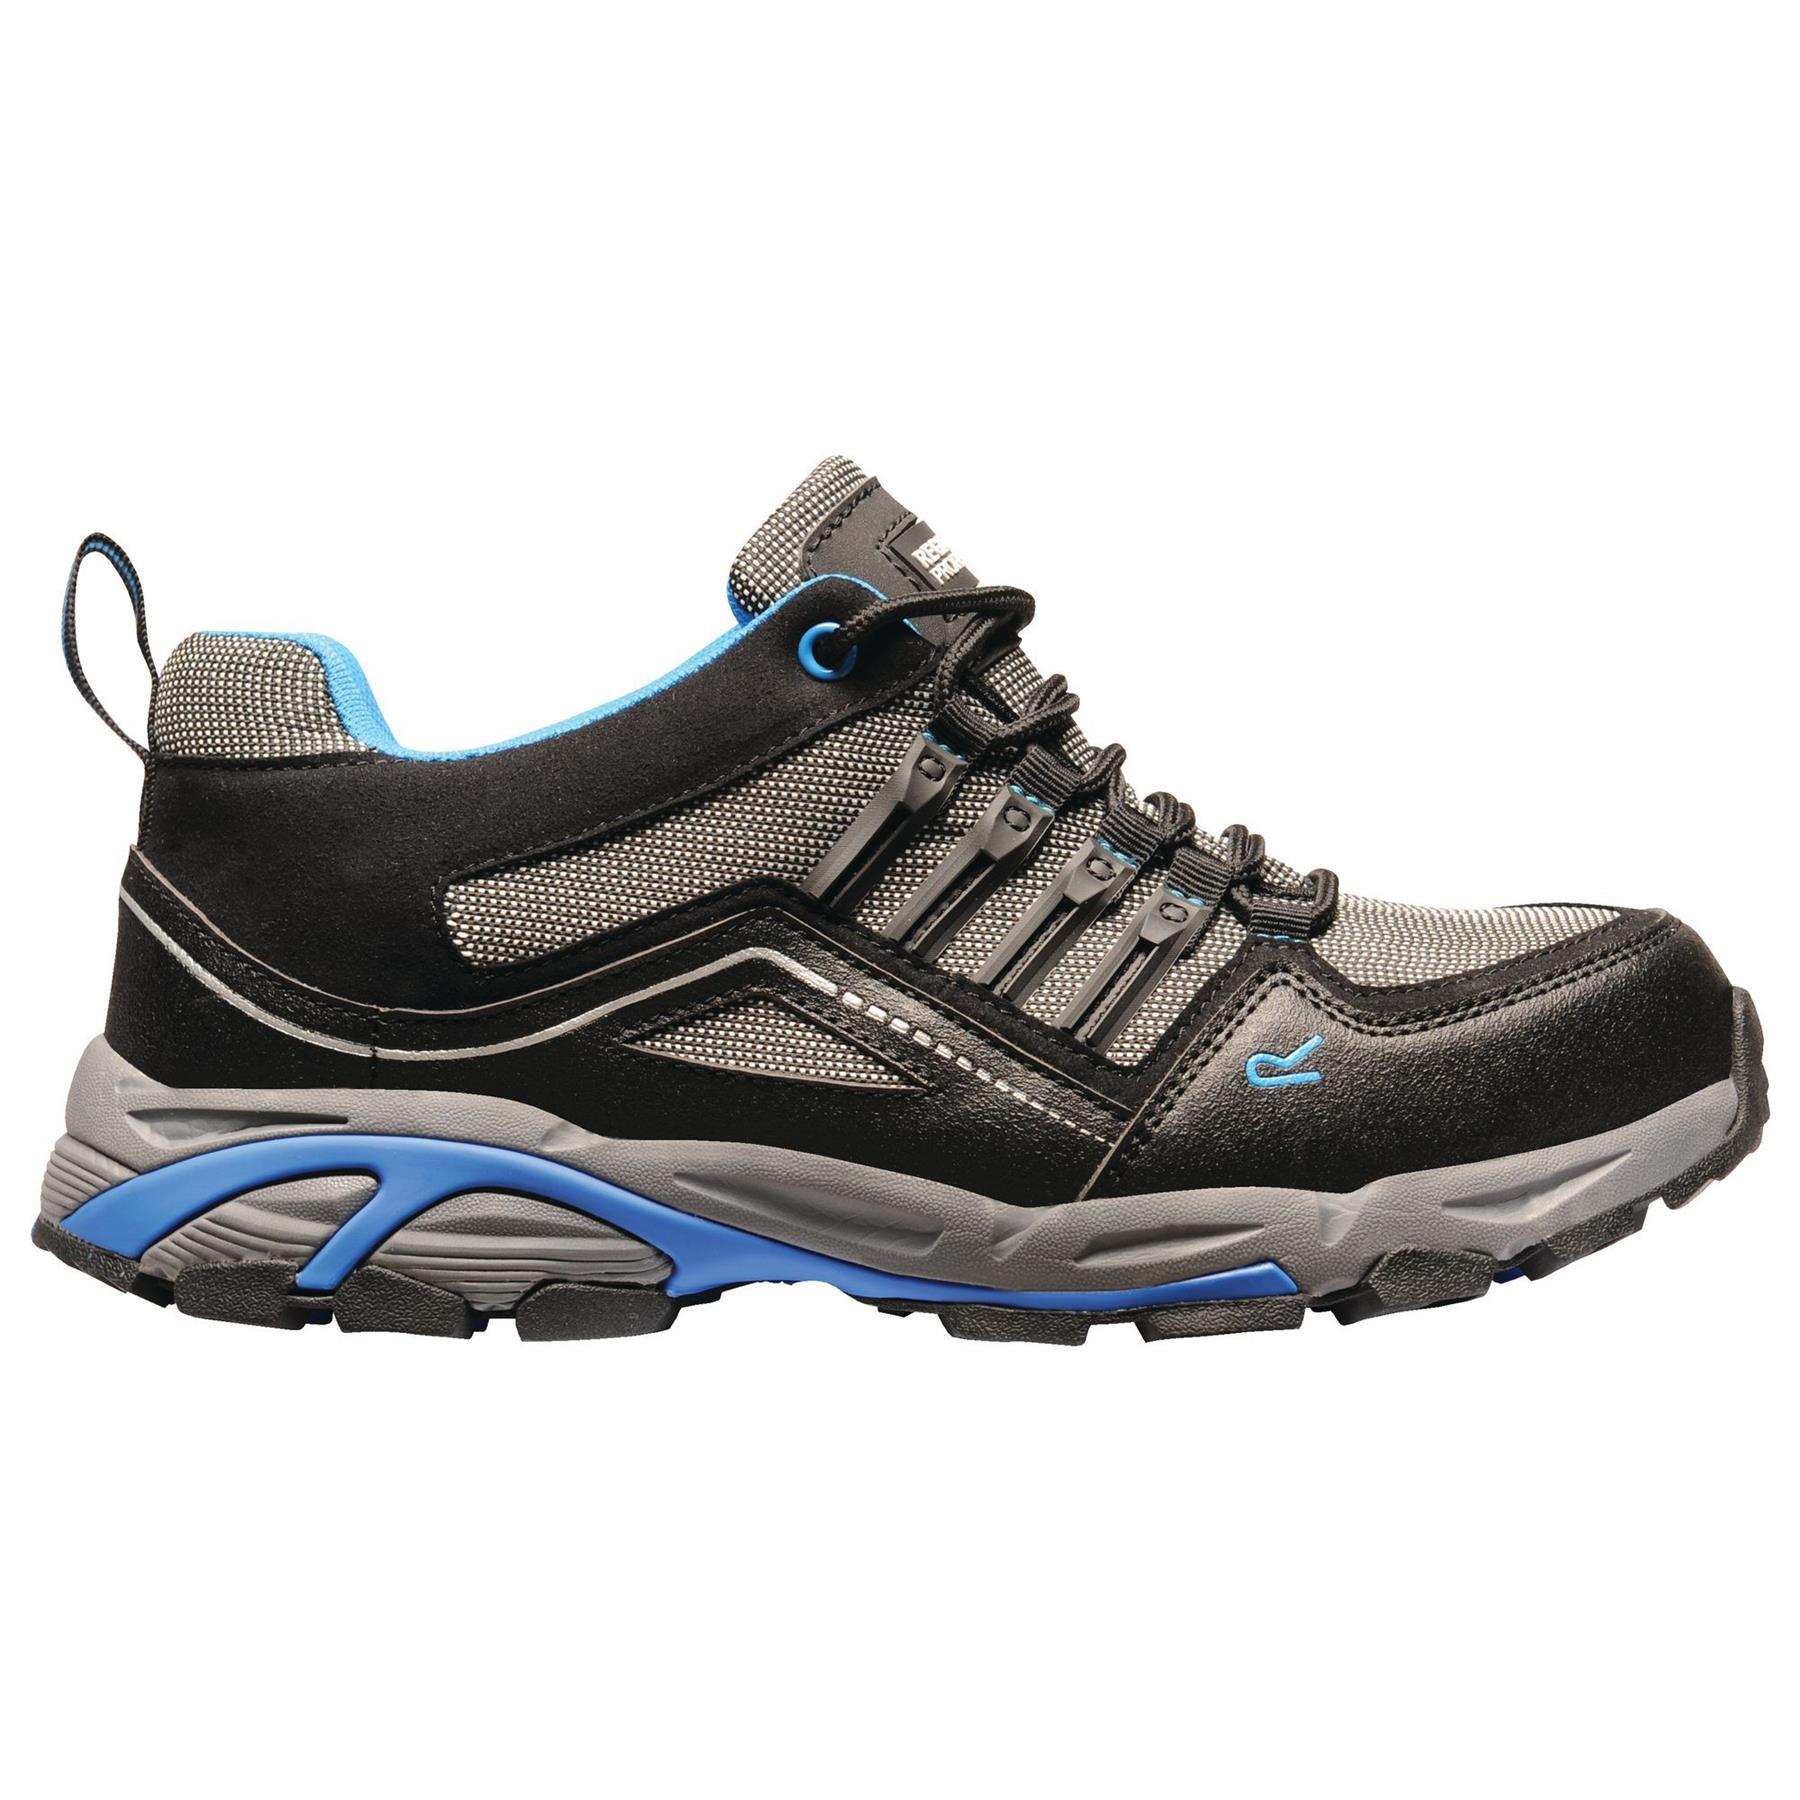 miniatuur 7 - Regatta Mens Work Safety Protective Shoes Steel Toe Cap Boots Workwear